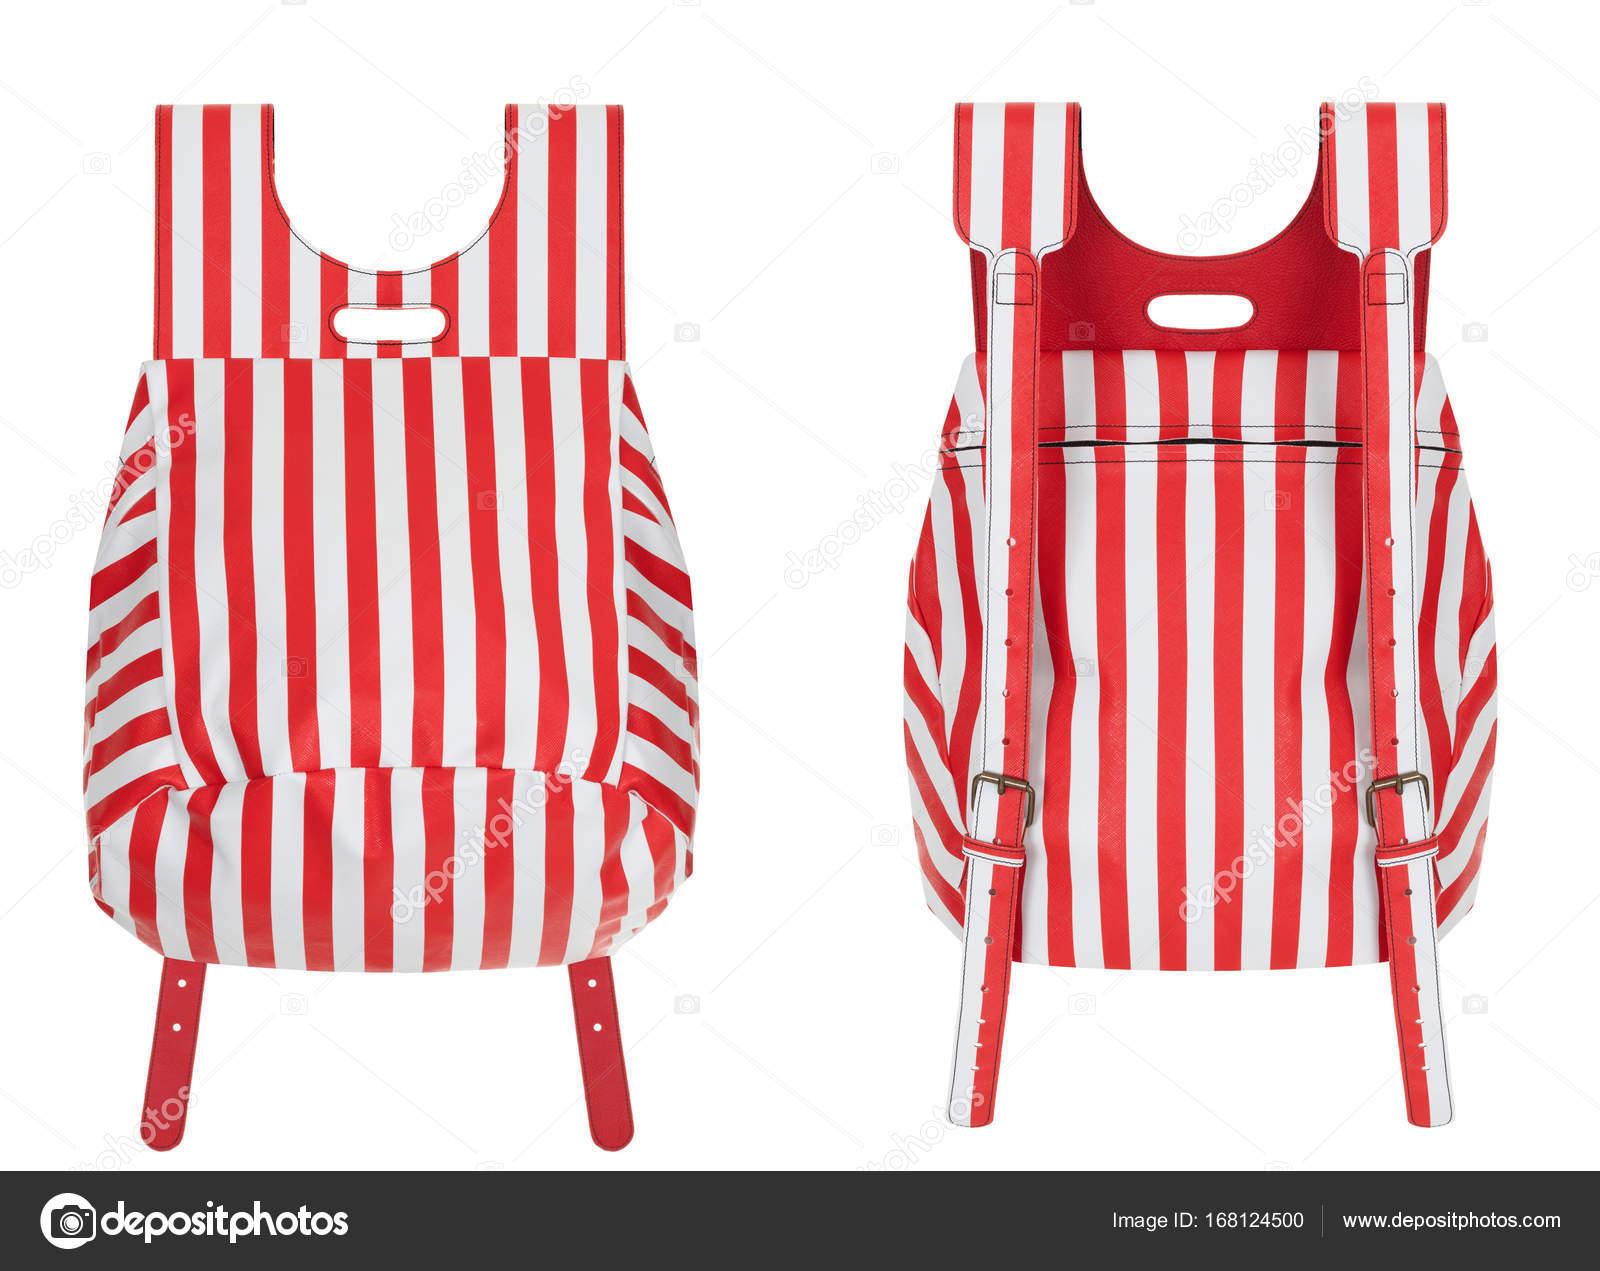 30d1b22acd Υπέροχη πολυτέλεια κόκκινες και άσπρες ρίγες πανέμορφη δερμάτινη τσάντα σε  λευκό φόντο